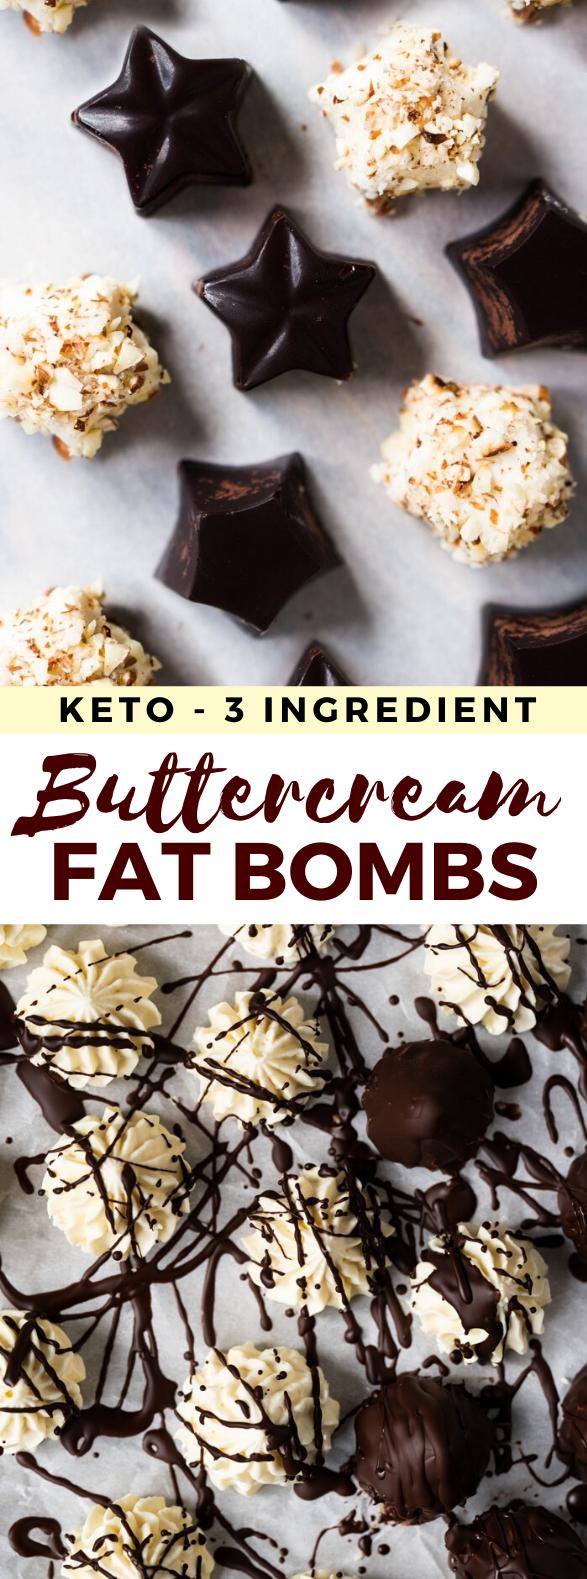 BUTTERCREAM KETO FAT BOMBS #glutenfree #lowcarb